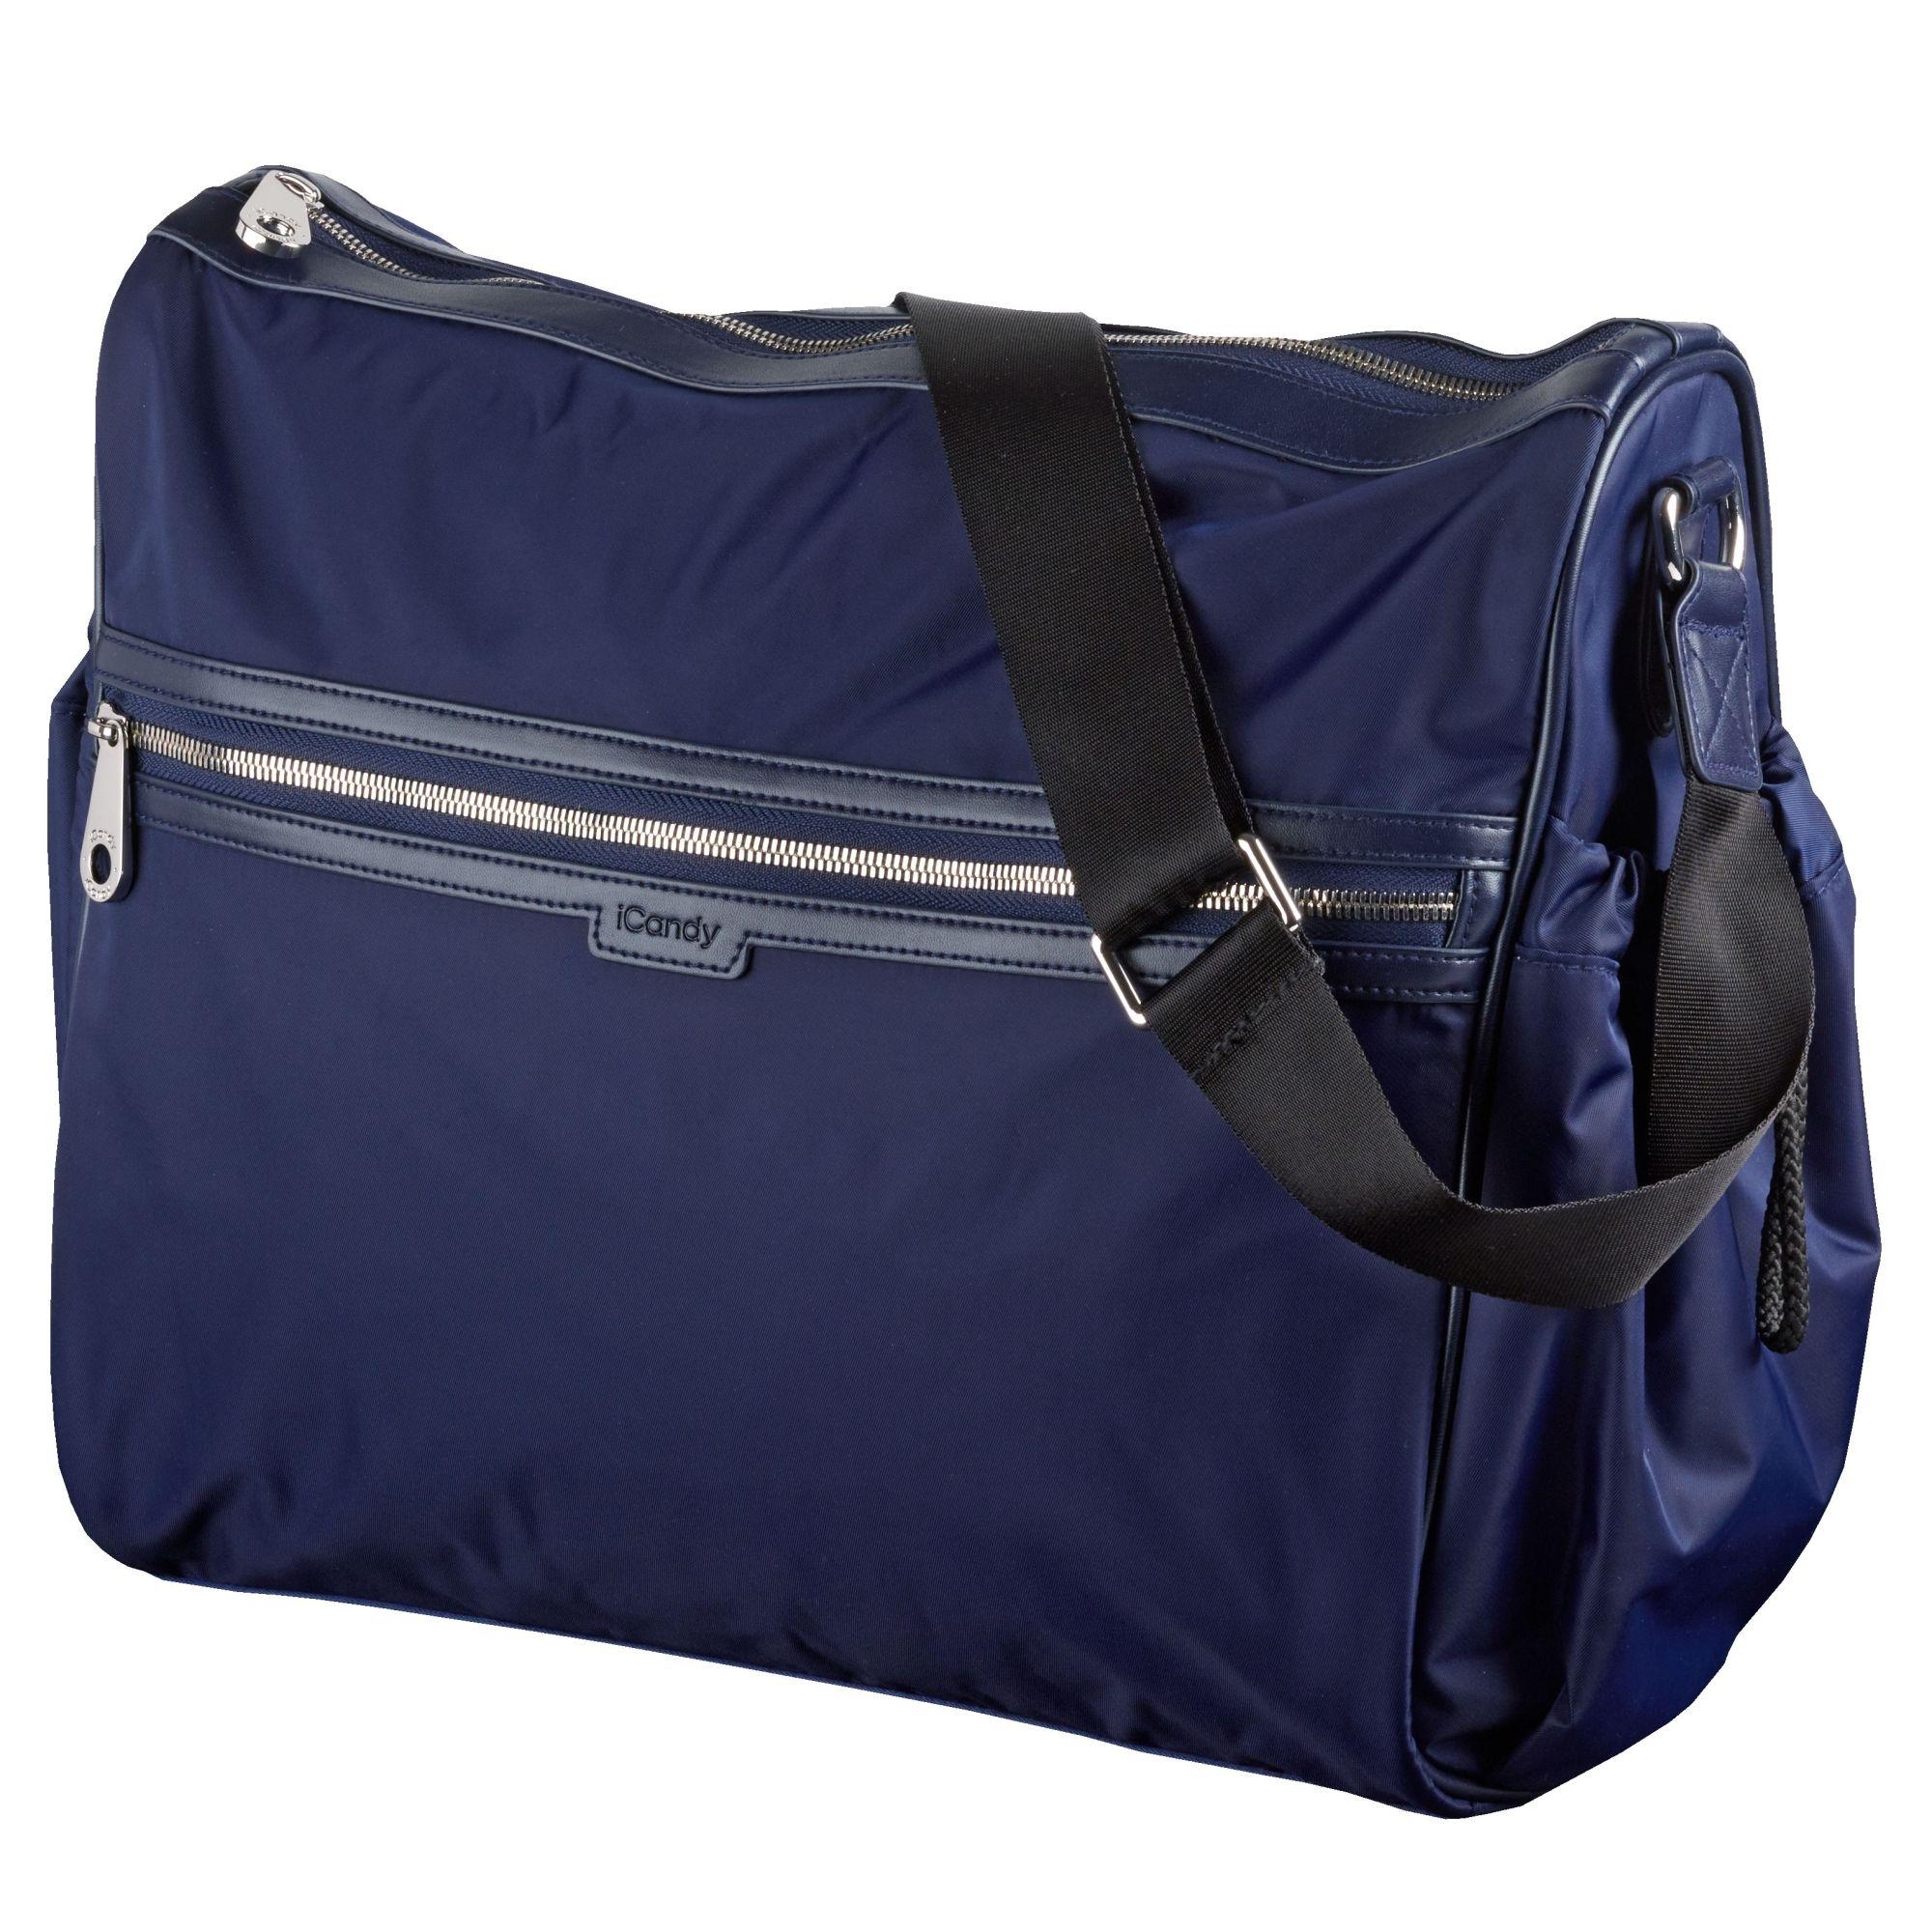 iCandy Lifestyle Bag Charlie Blue